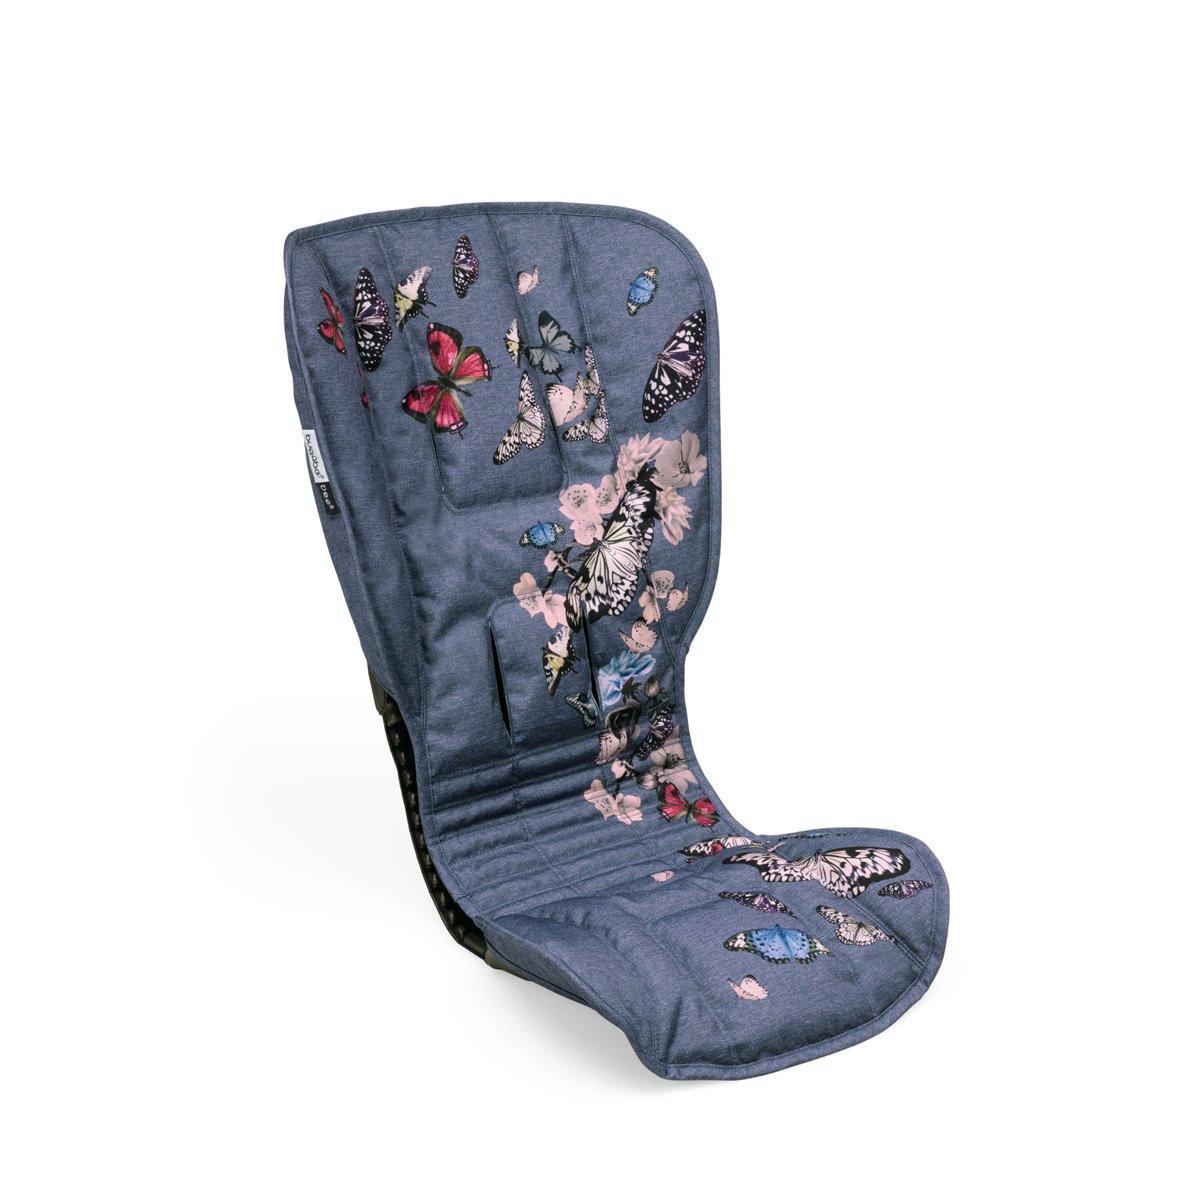 Bugaboo Bee5 Seat Fabrics Botanic 520226BF01